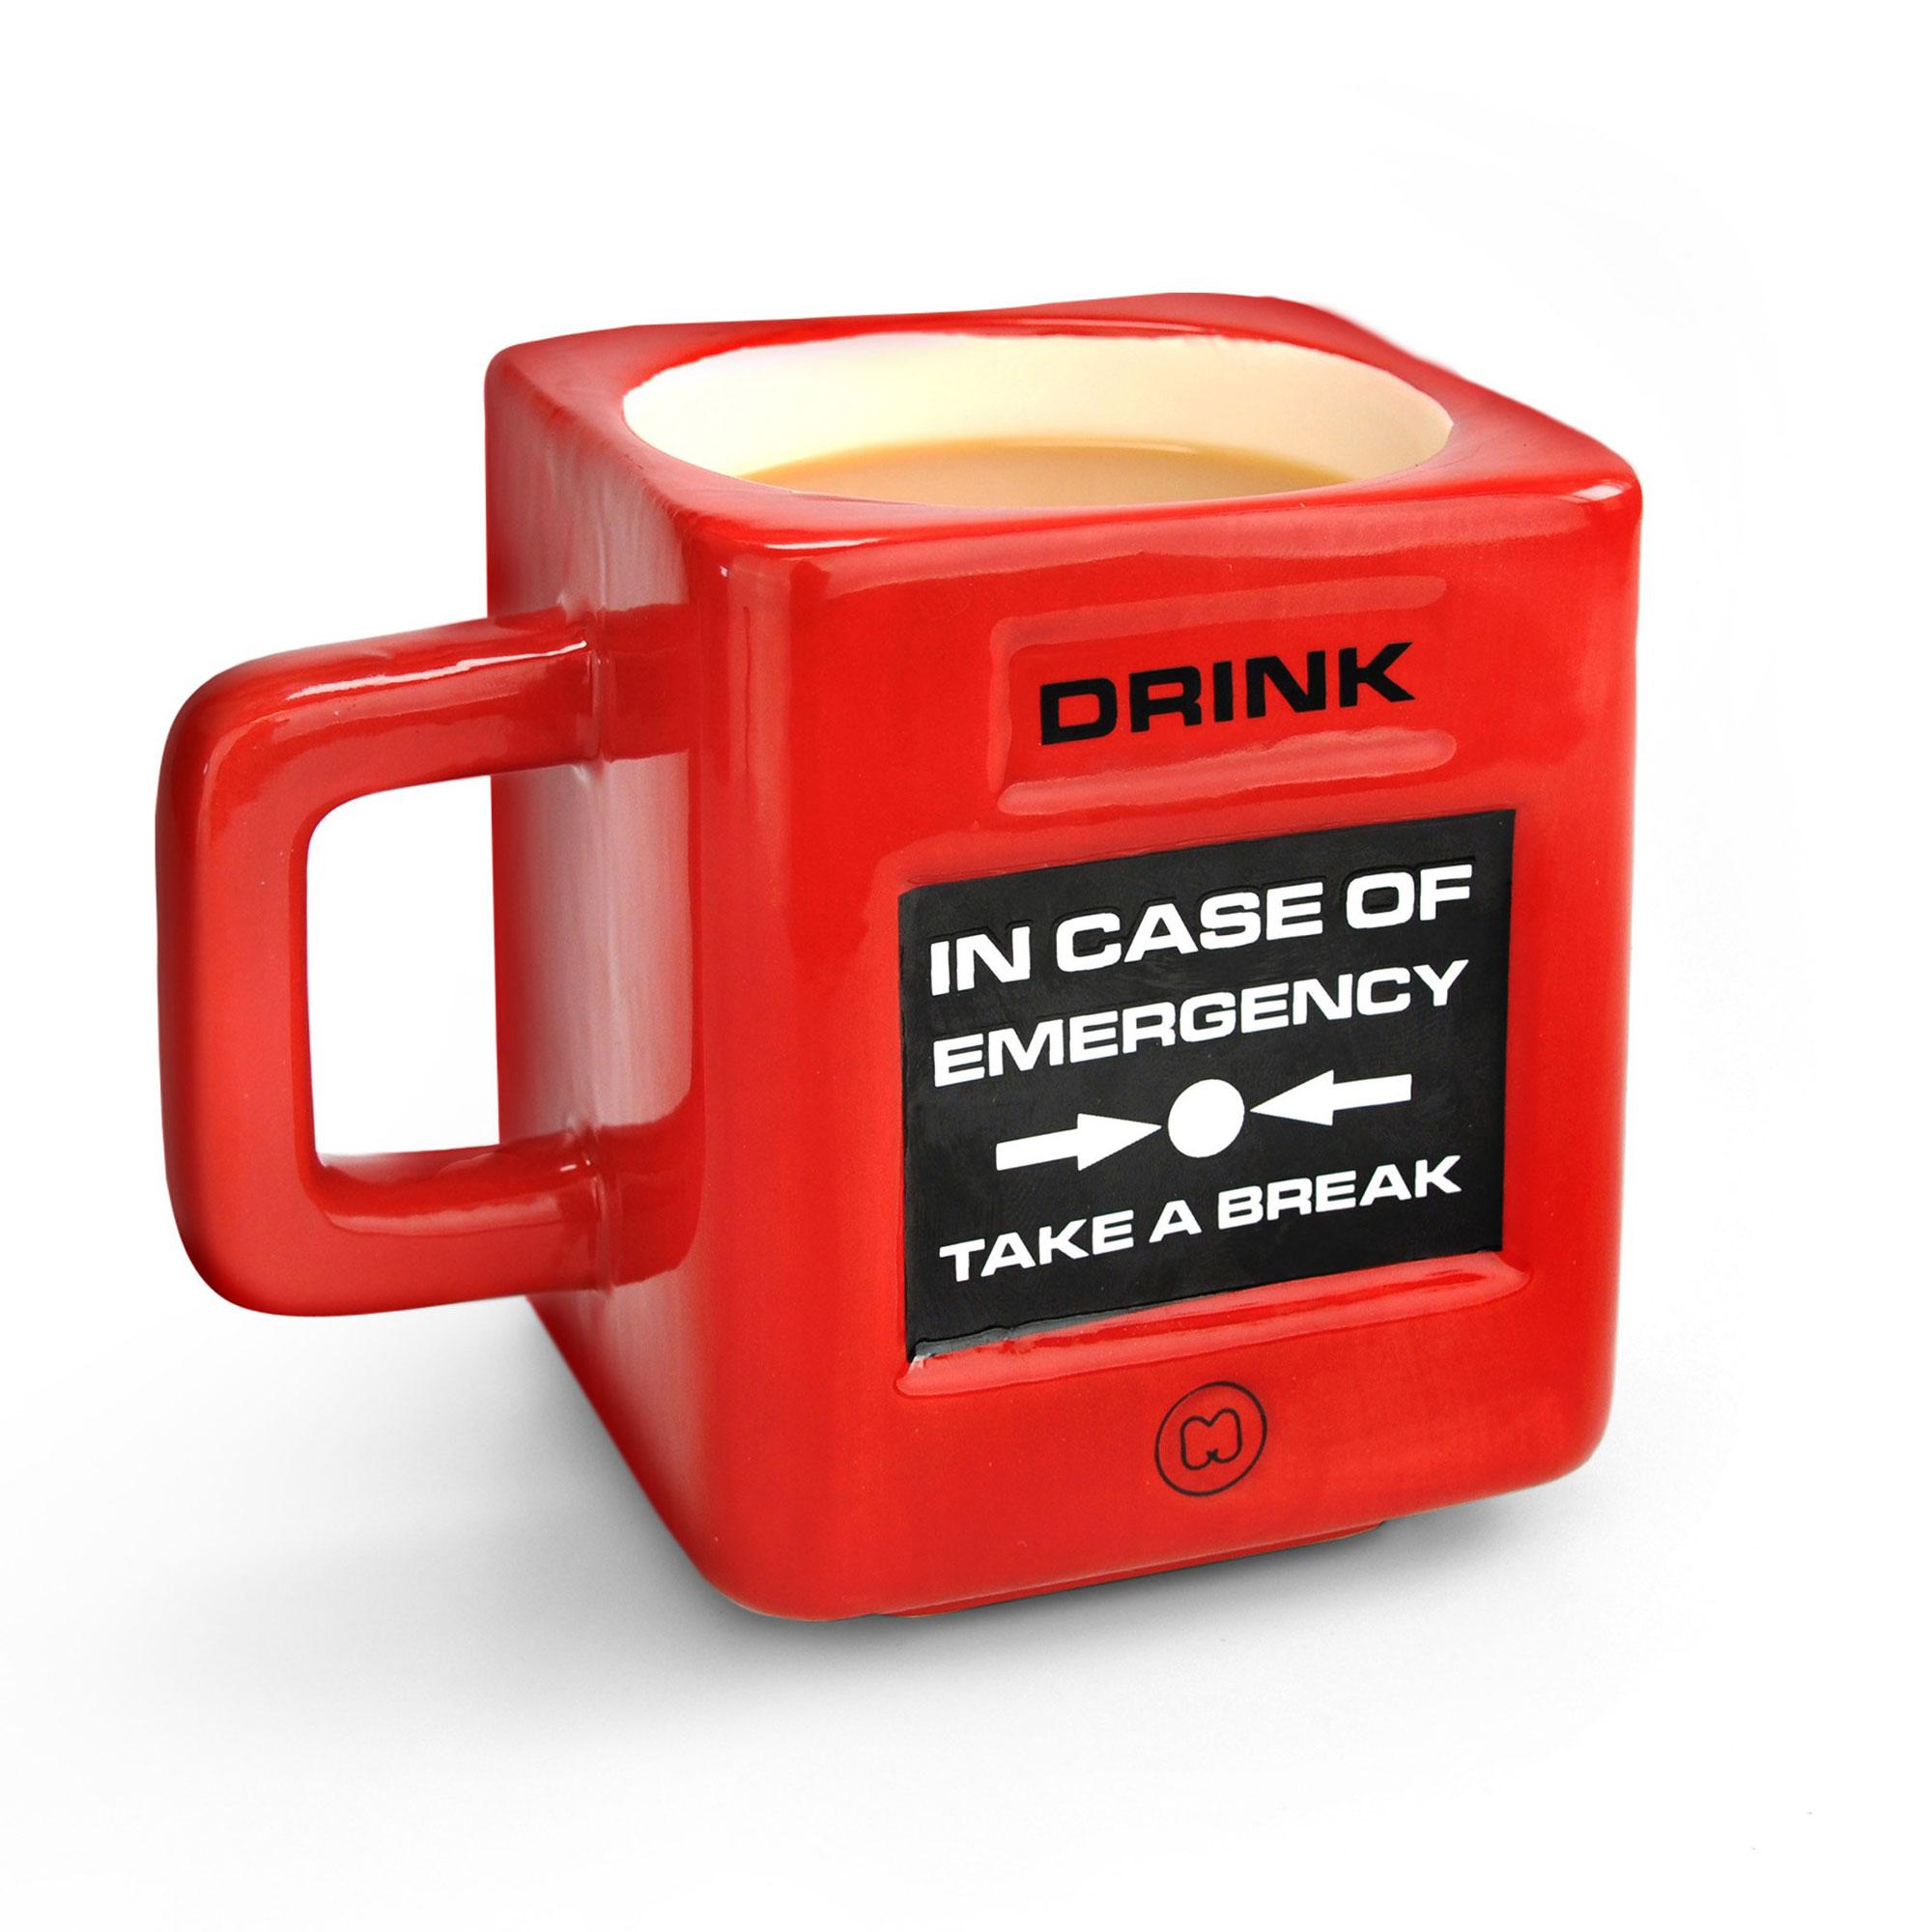 Mustard Take a Break Fire Alarm Shaped Mug